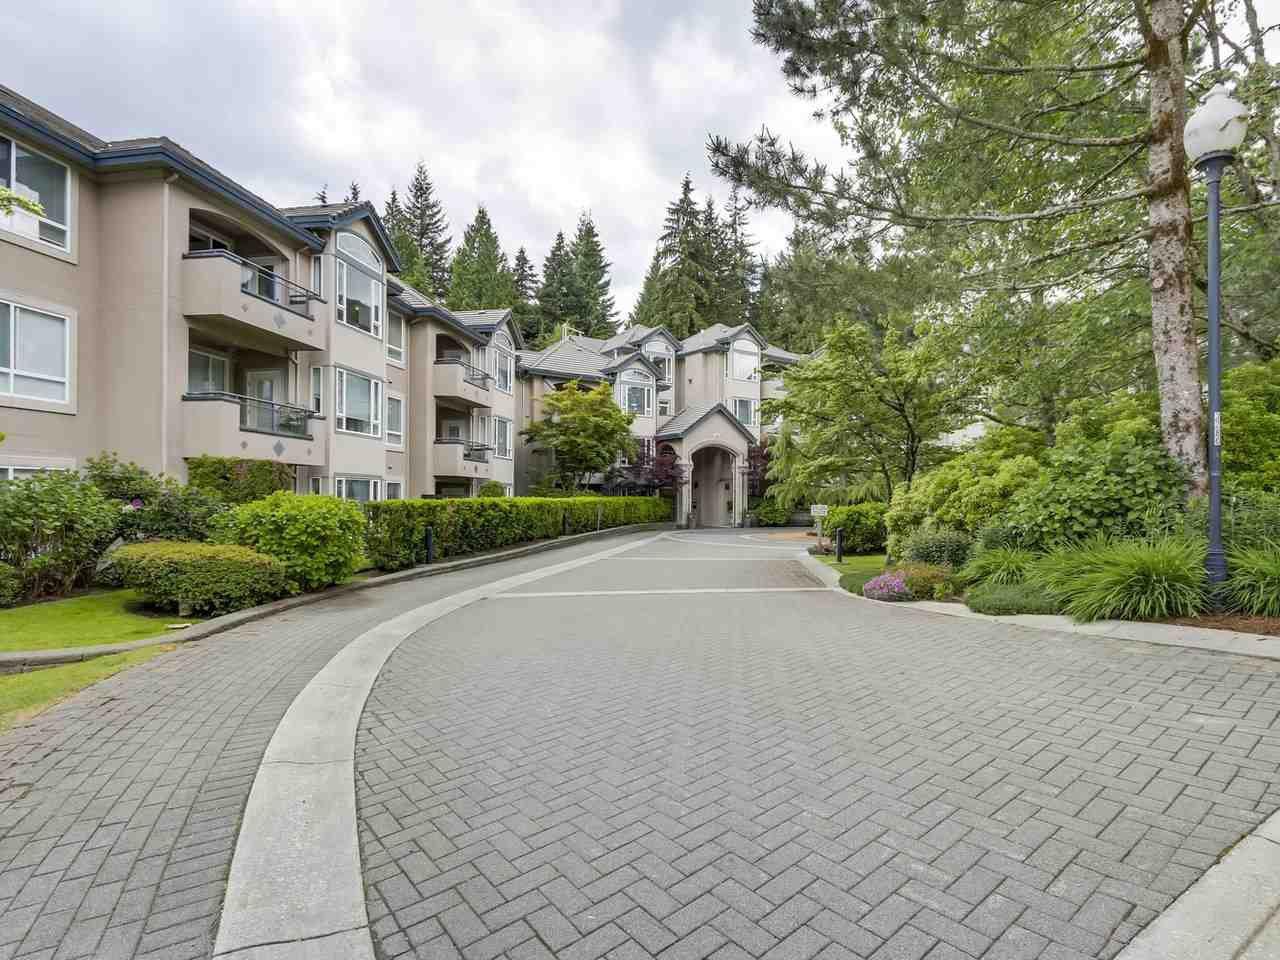 Photo 1: Photos: 303 3280 PLATEAU BOULEVARD in Coquitlam: Westwood Plateau Condo for sale : MLS®# R2275918